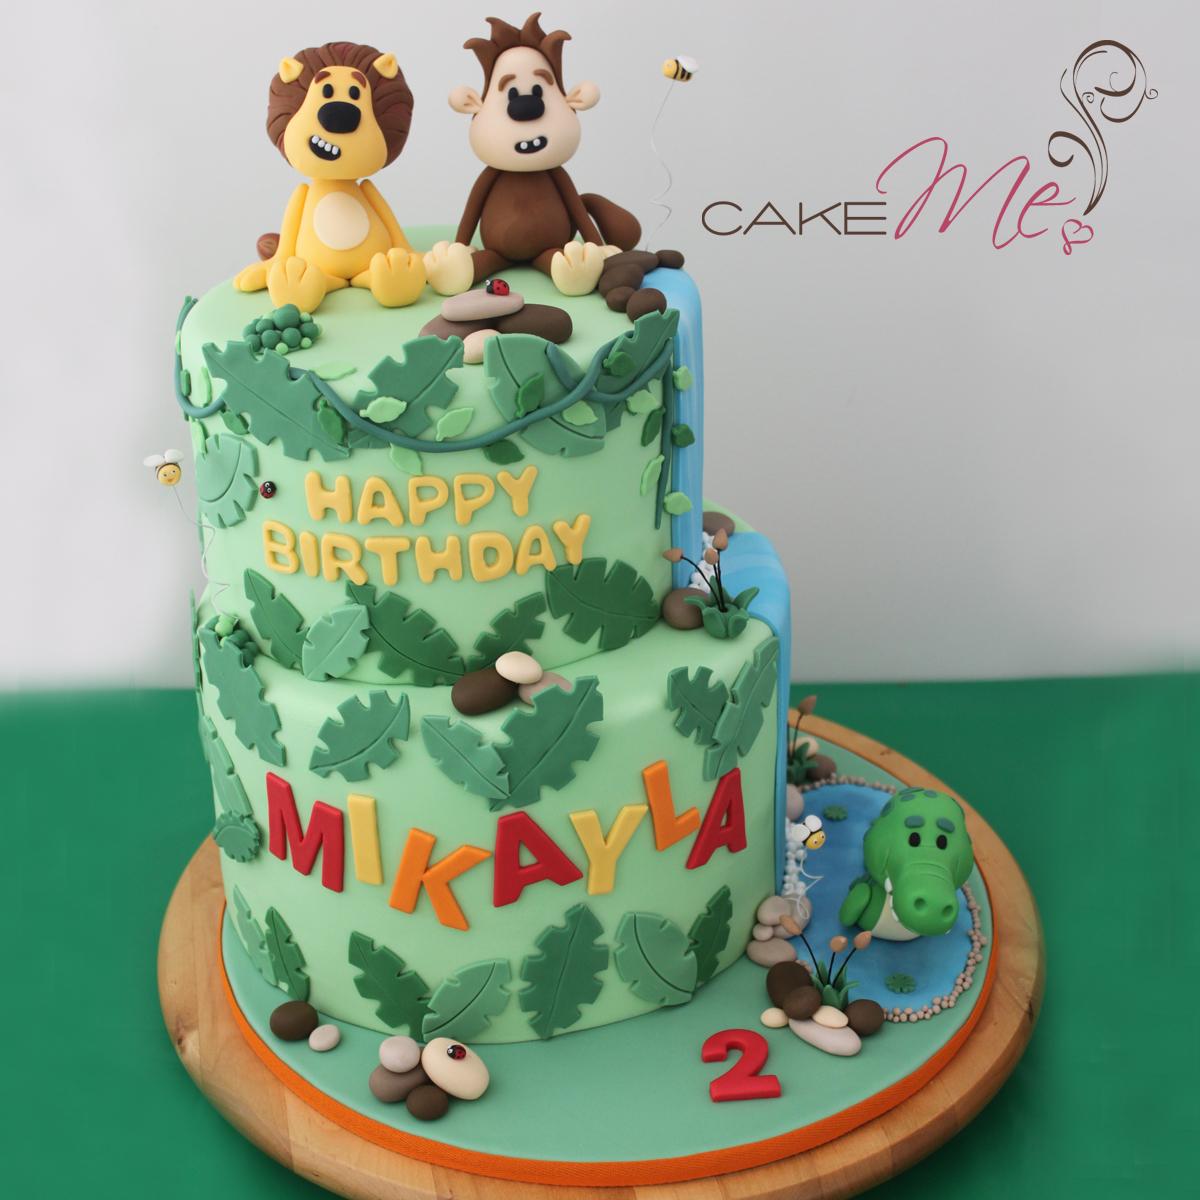 Cake Me! IMG_9635.jpg